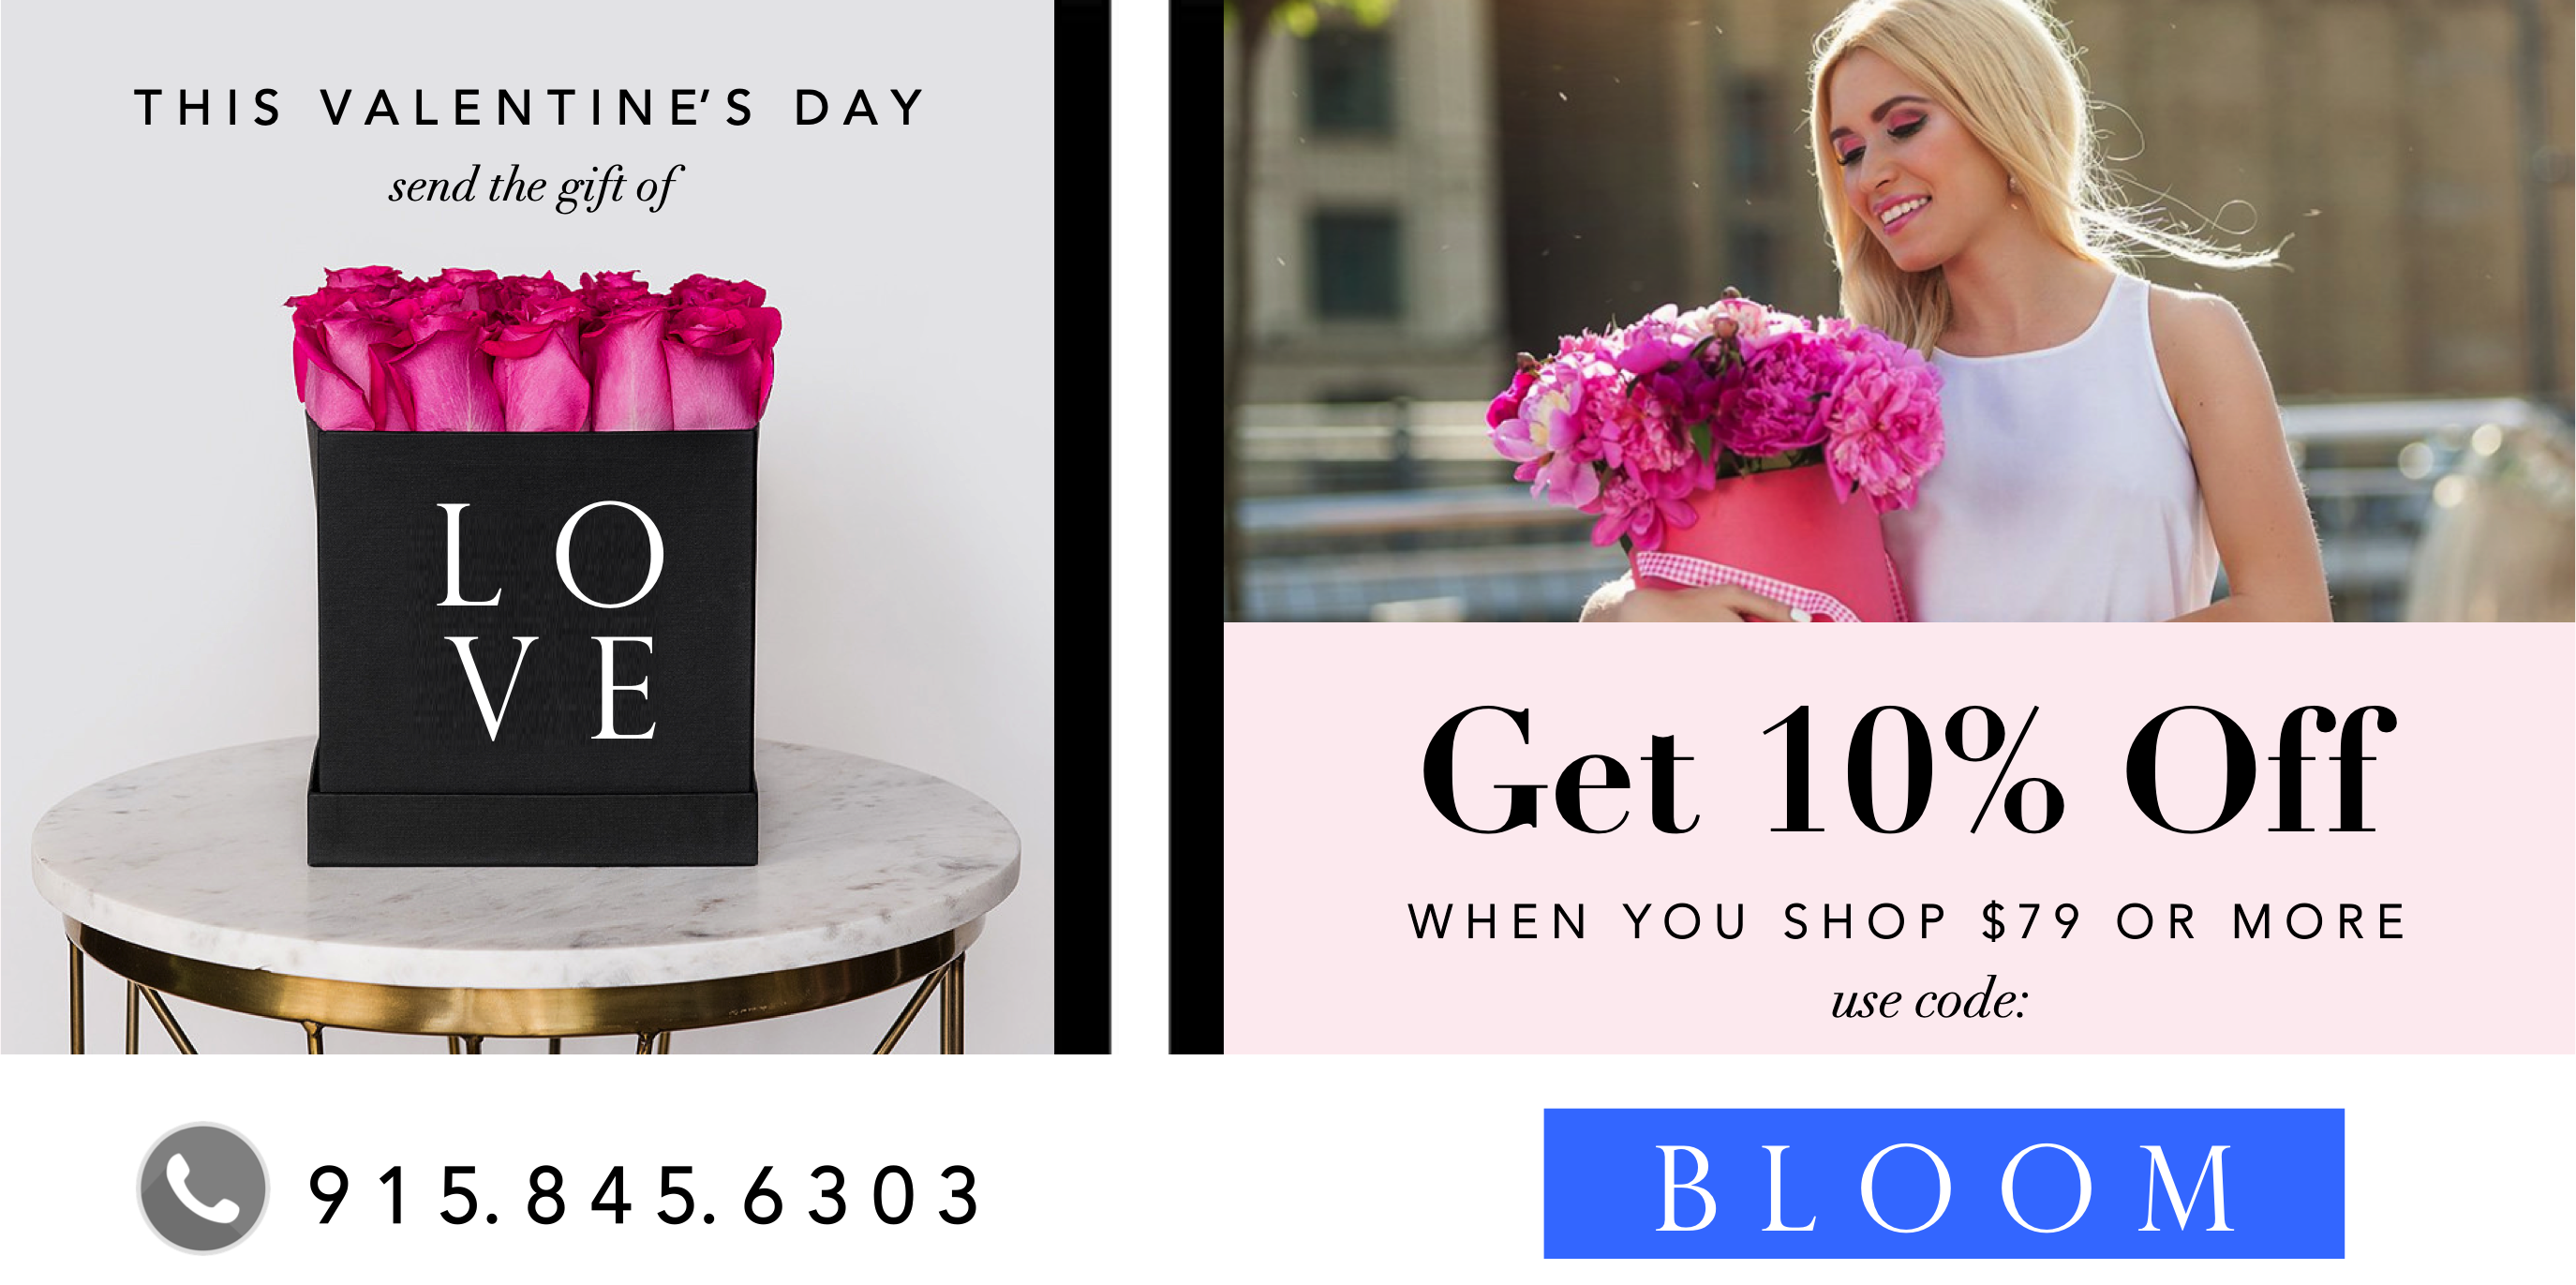 0010-hi-valentine-s-day-flowers-1-2019angies-floral-designs-el-paso-florist-flowers-valentines-day-flores-de-san-valentine-flores-de-amor-.png